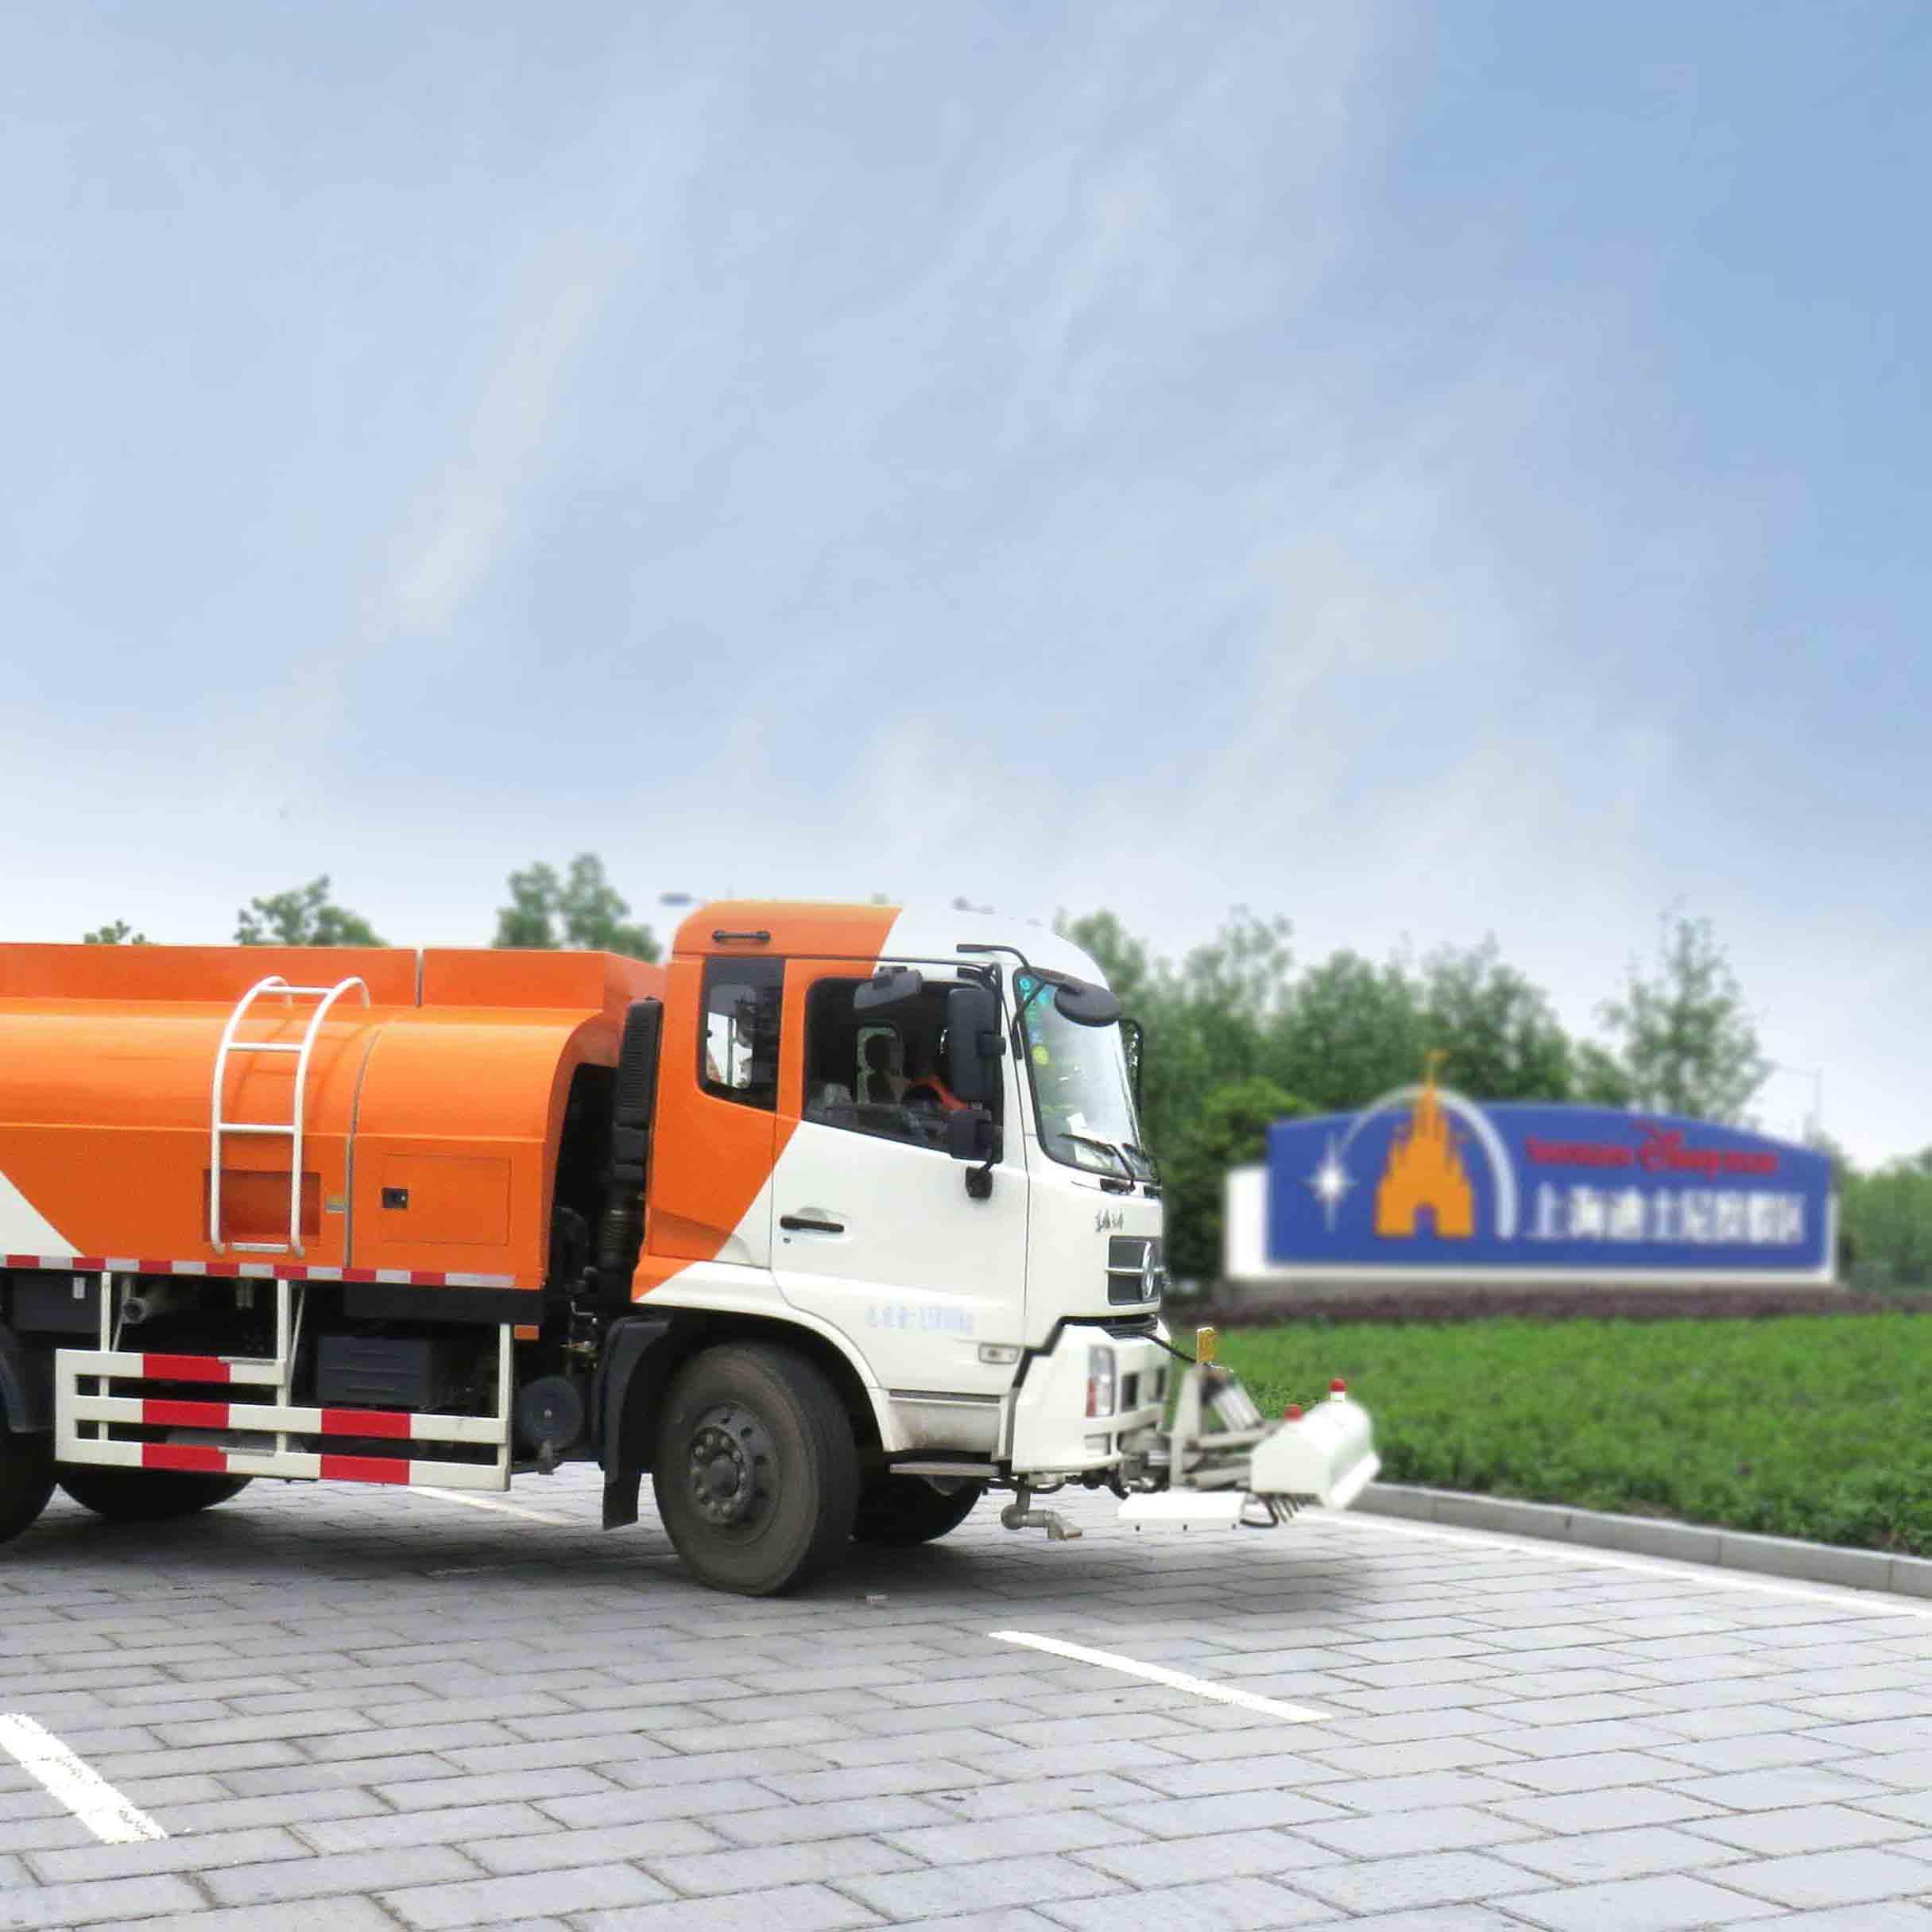 FULONGMA Donates Anti-epidemic Materials to Shanghai International Resort